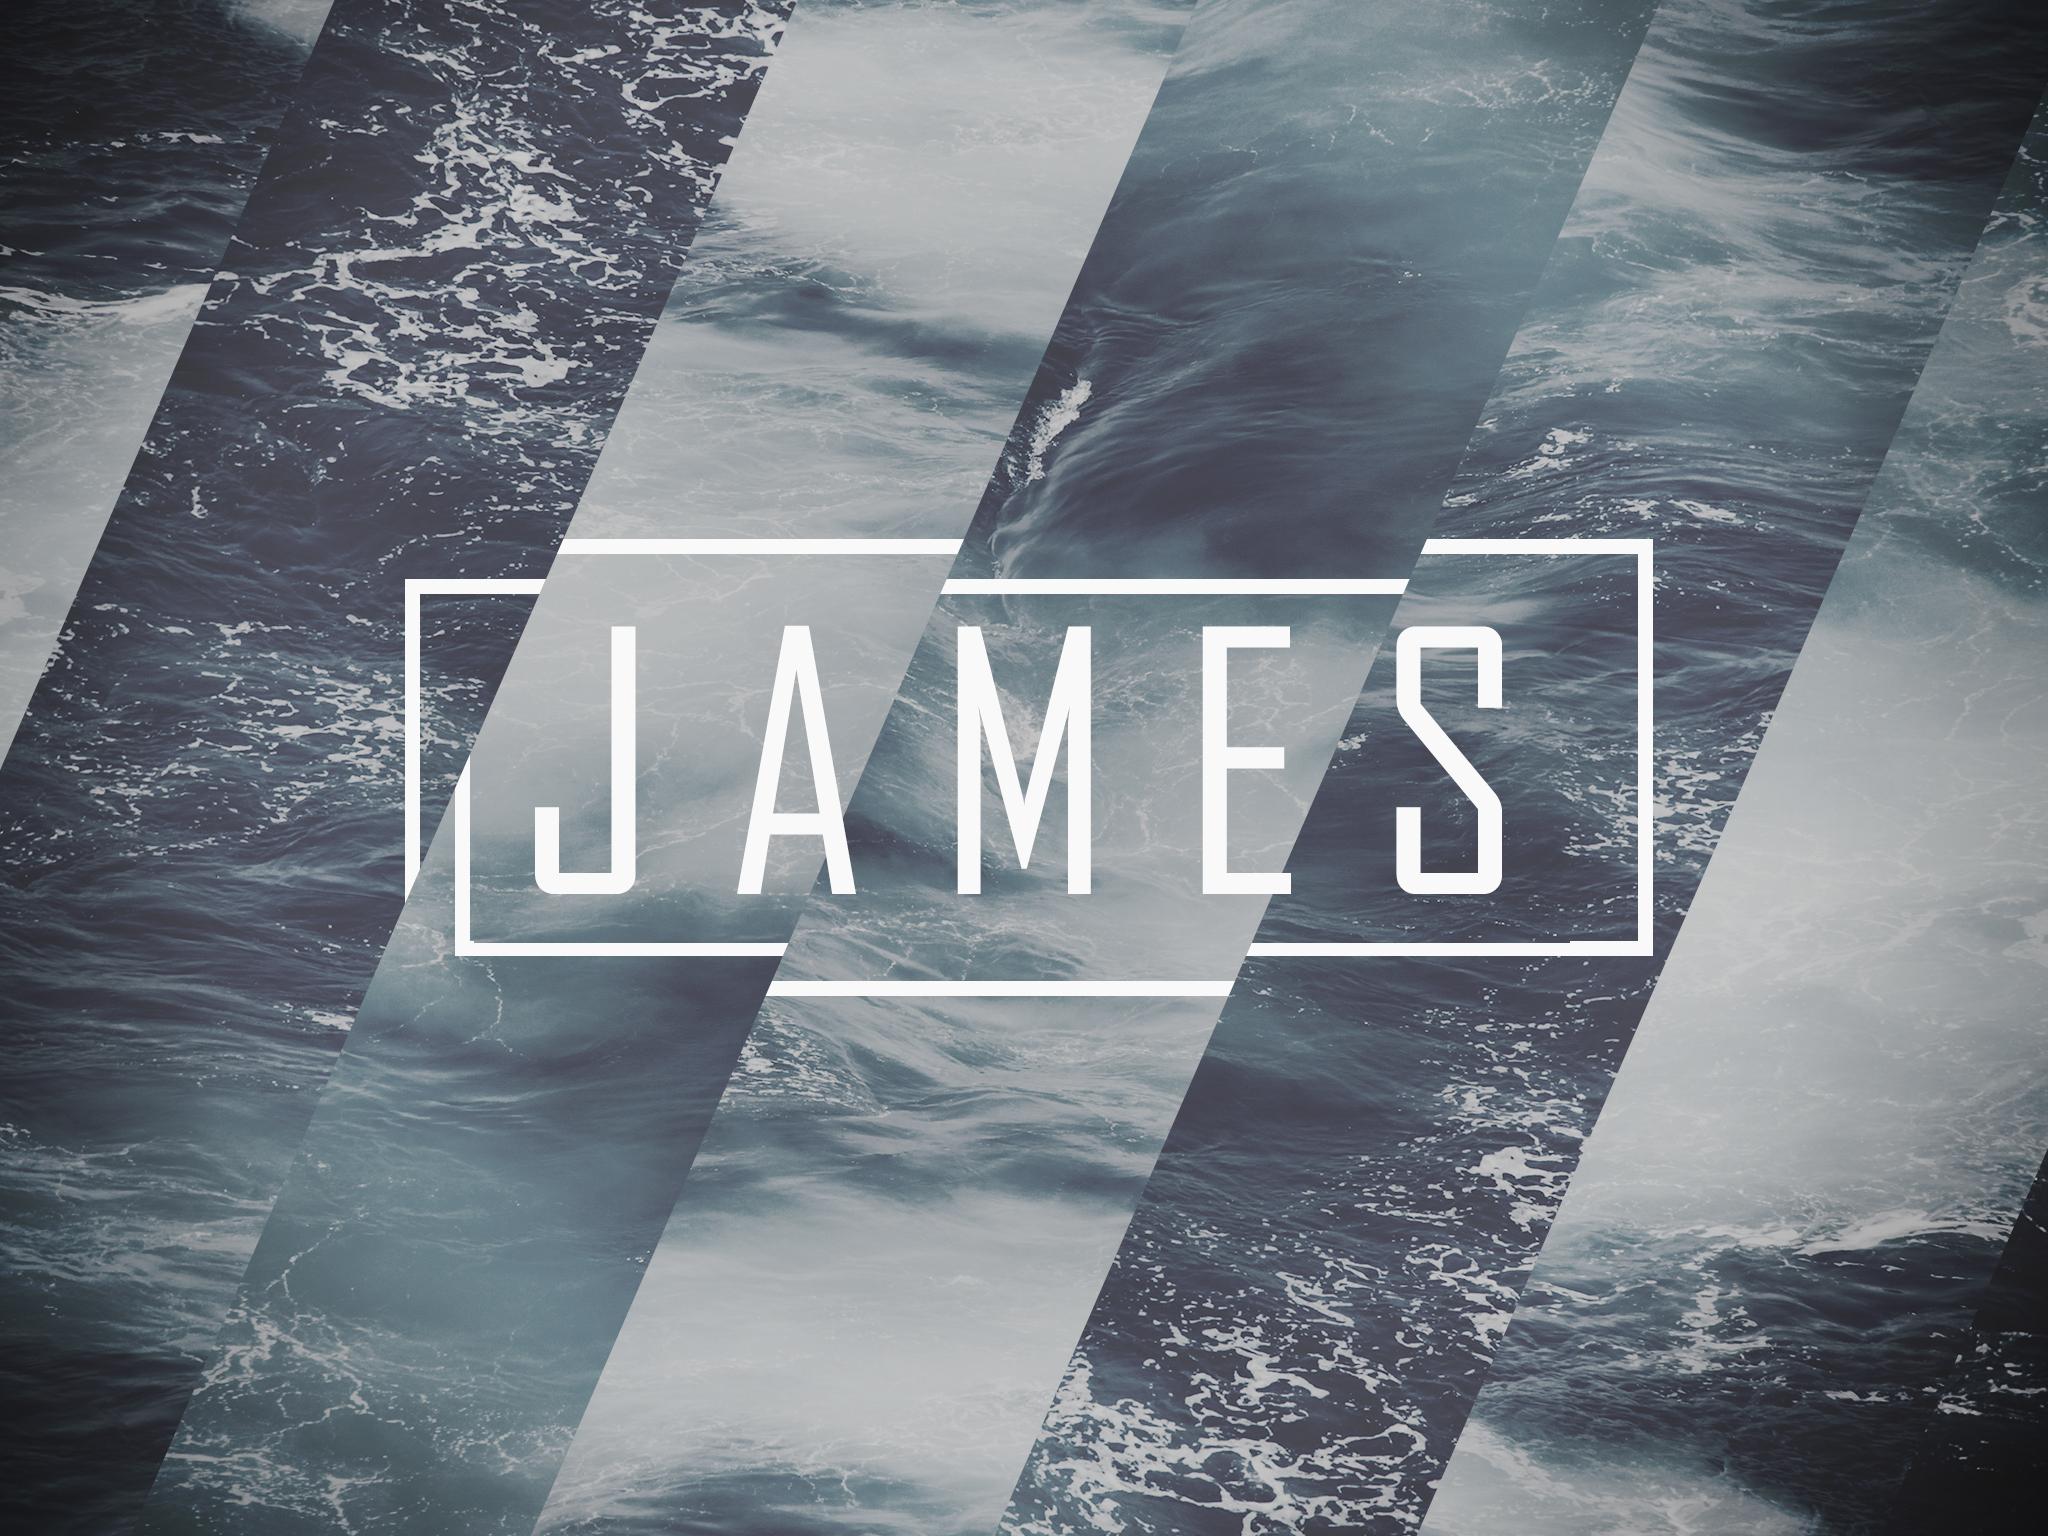 James_Title.jpg